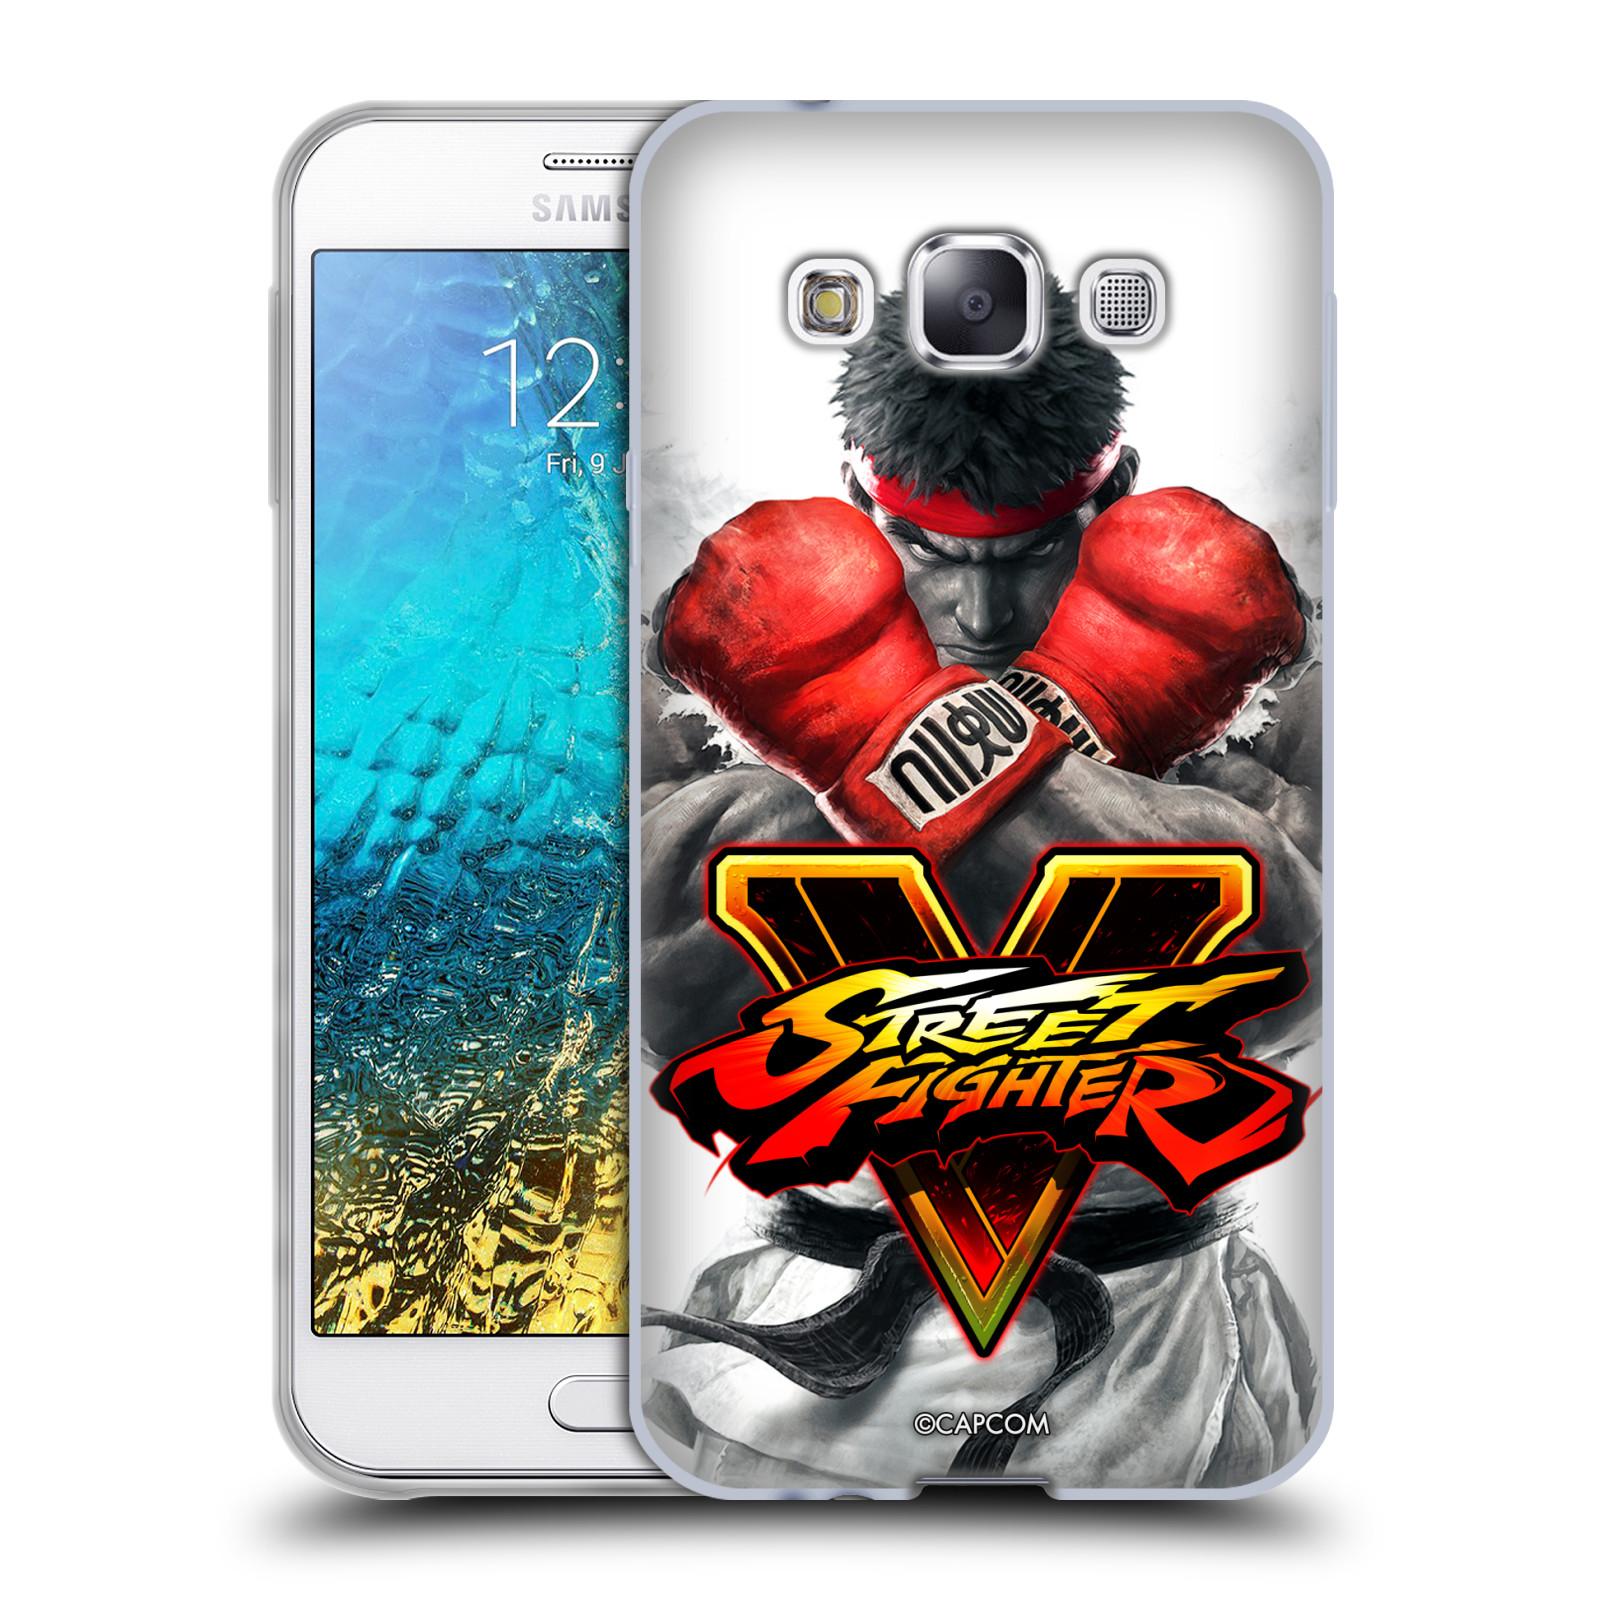 HEAD CASE silikonový obal na mobil Samsung Galaxy E5 oficiální kryt STREET FIGHTER Boxer Ryu